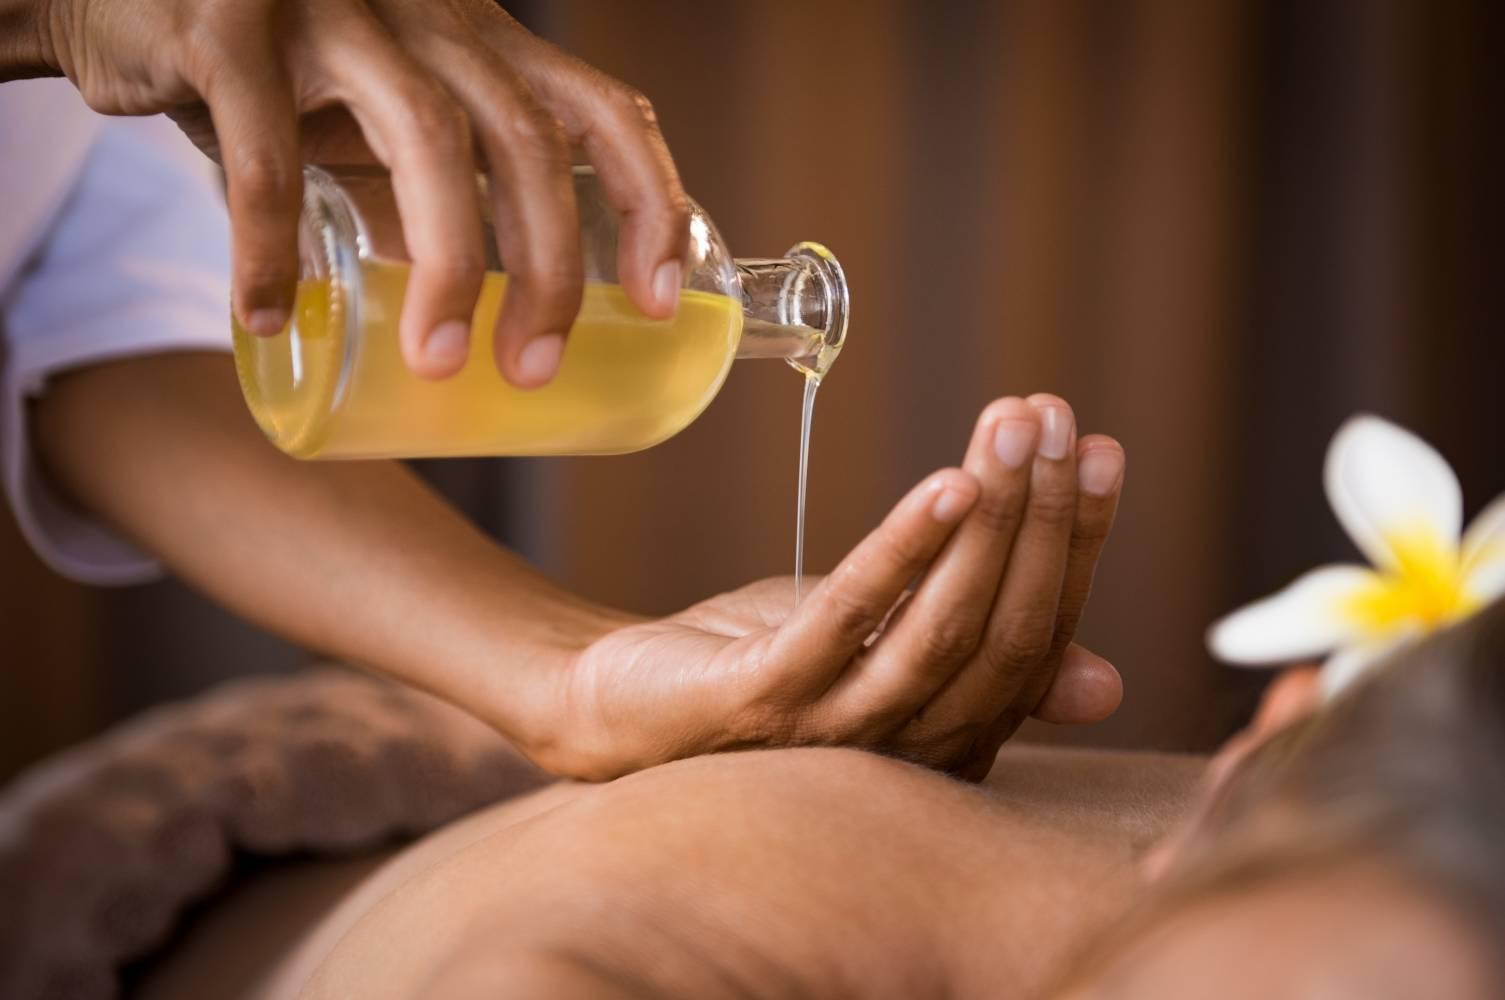 Massage giảm mỡ bụng bằng dầu dừa